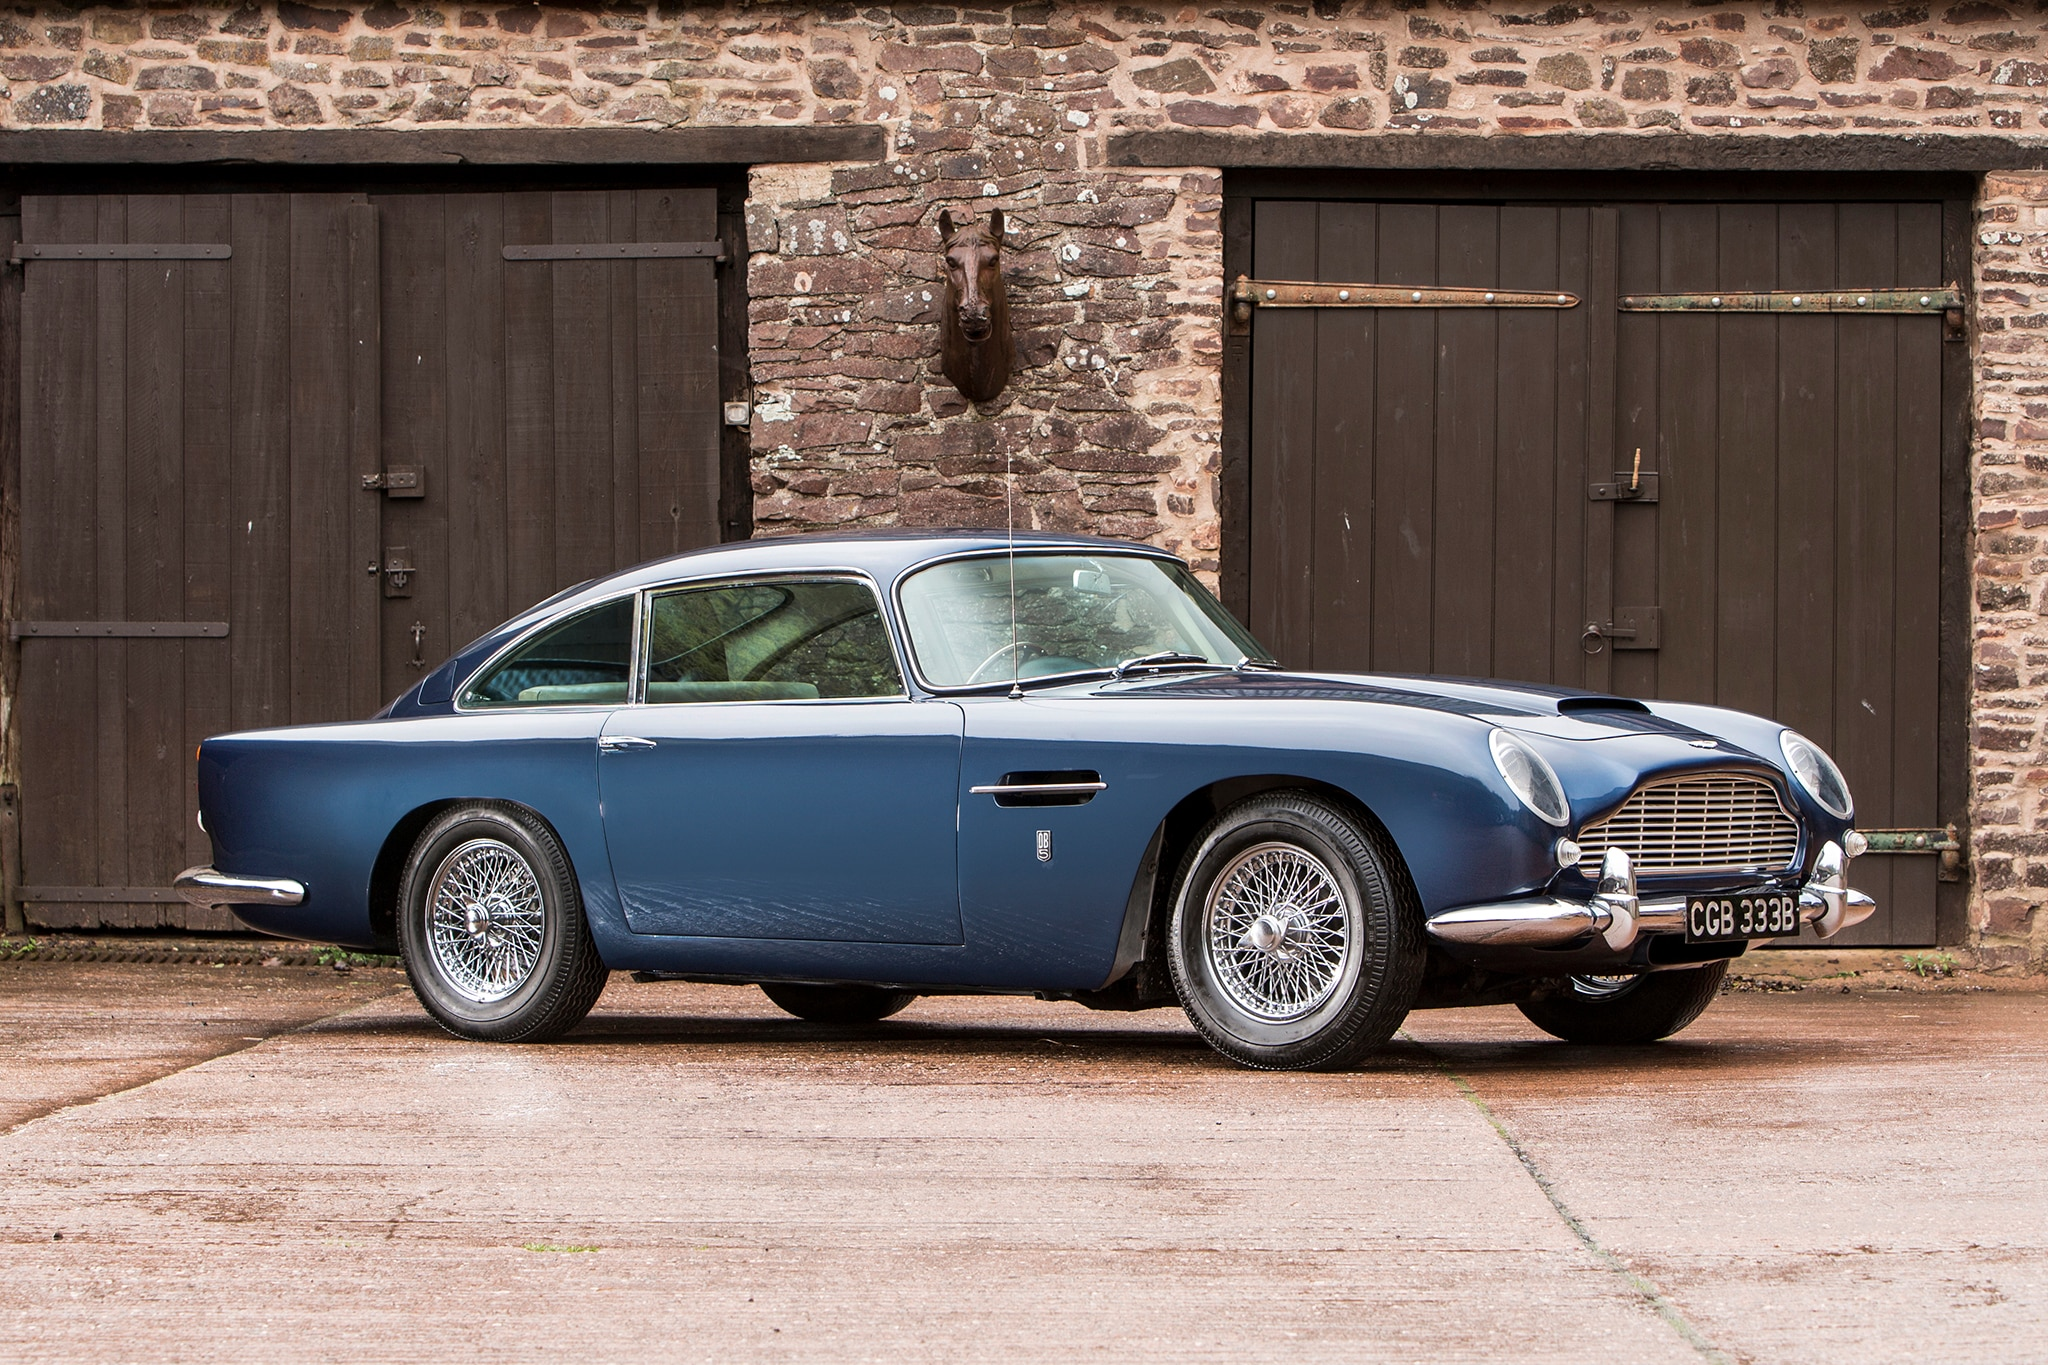 1964 Aston Martin DB5 Bonhams Front Three Quarters